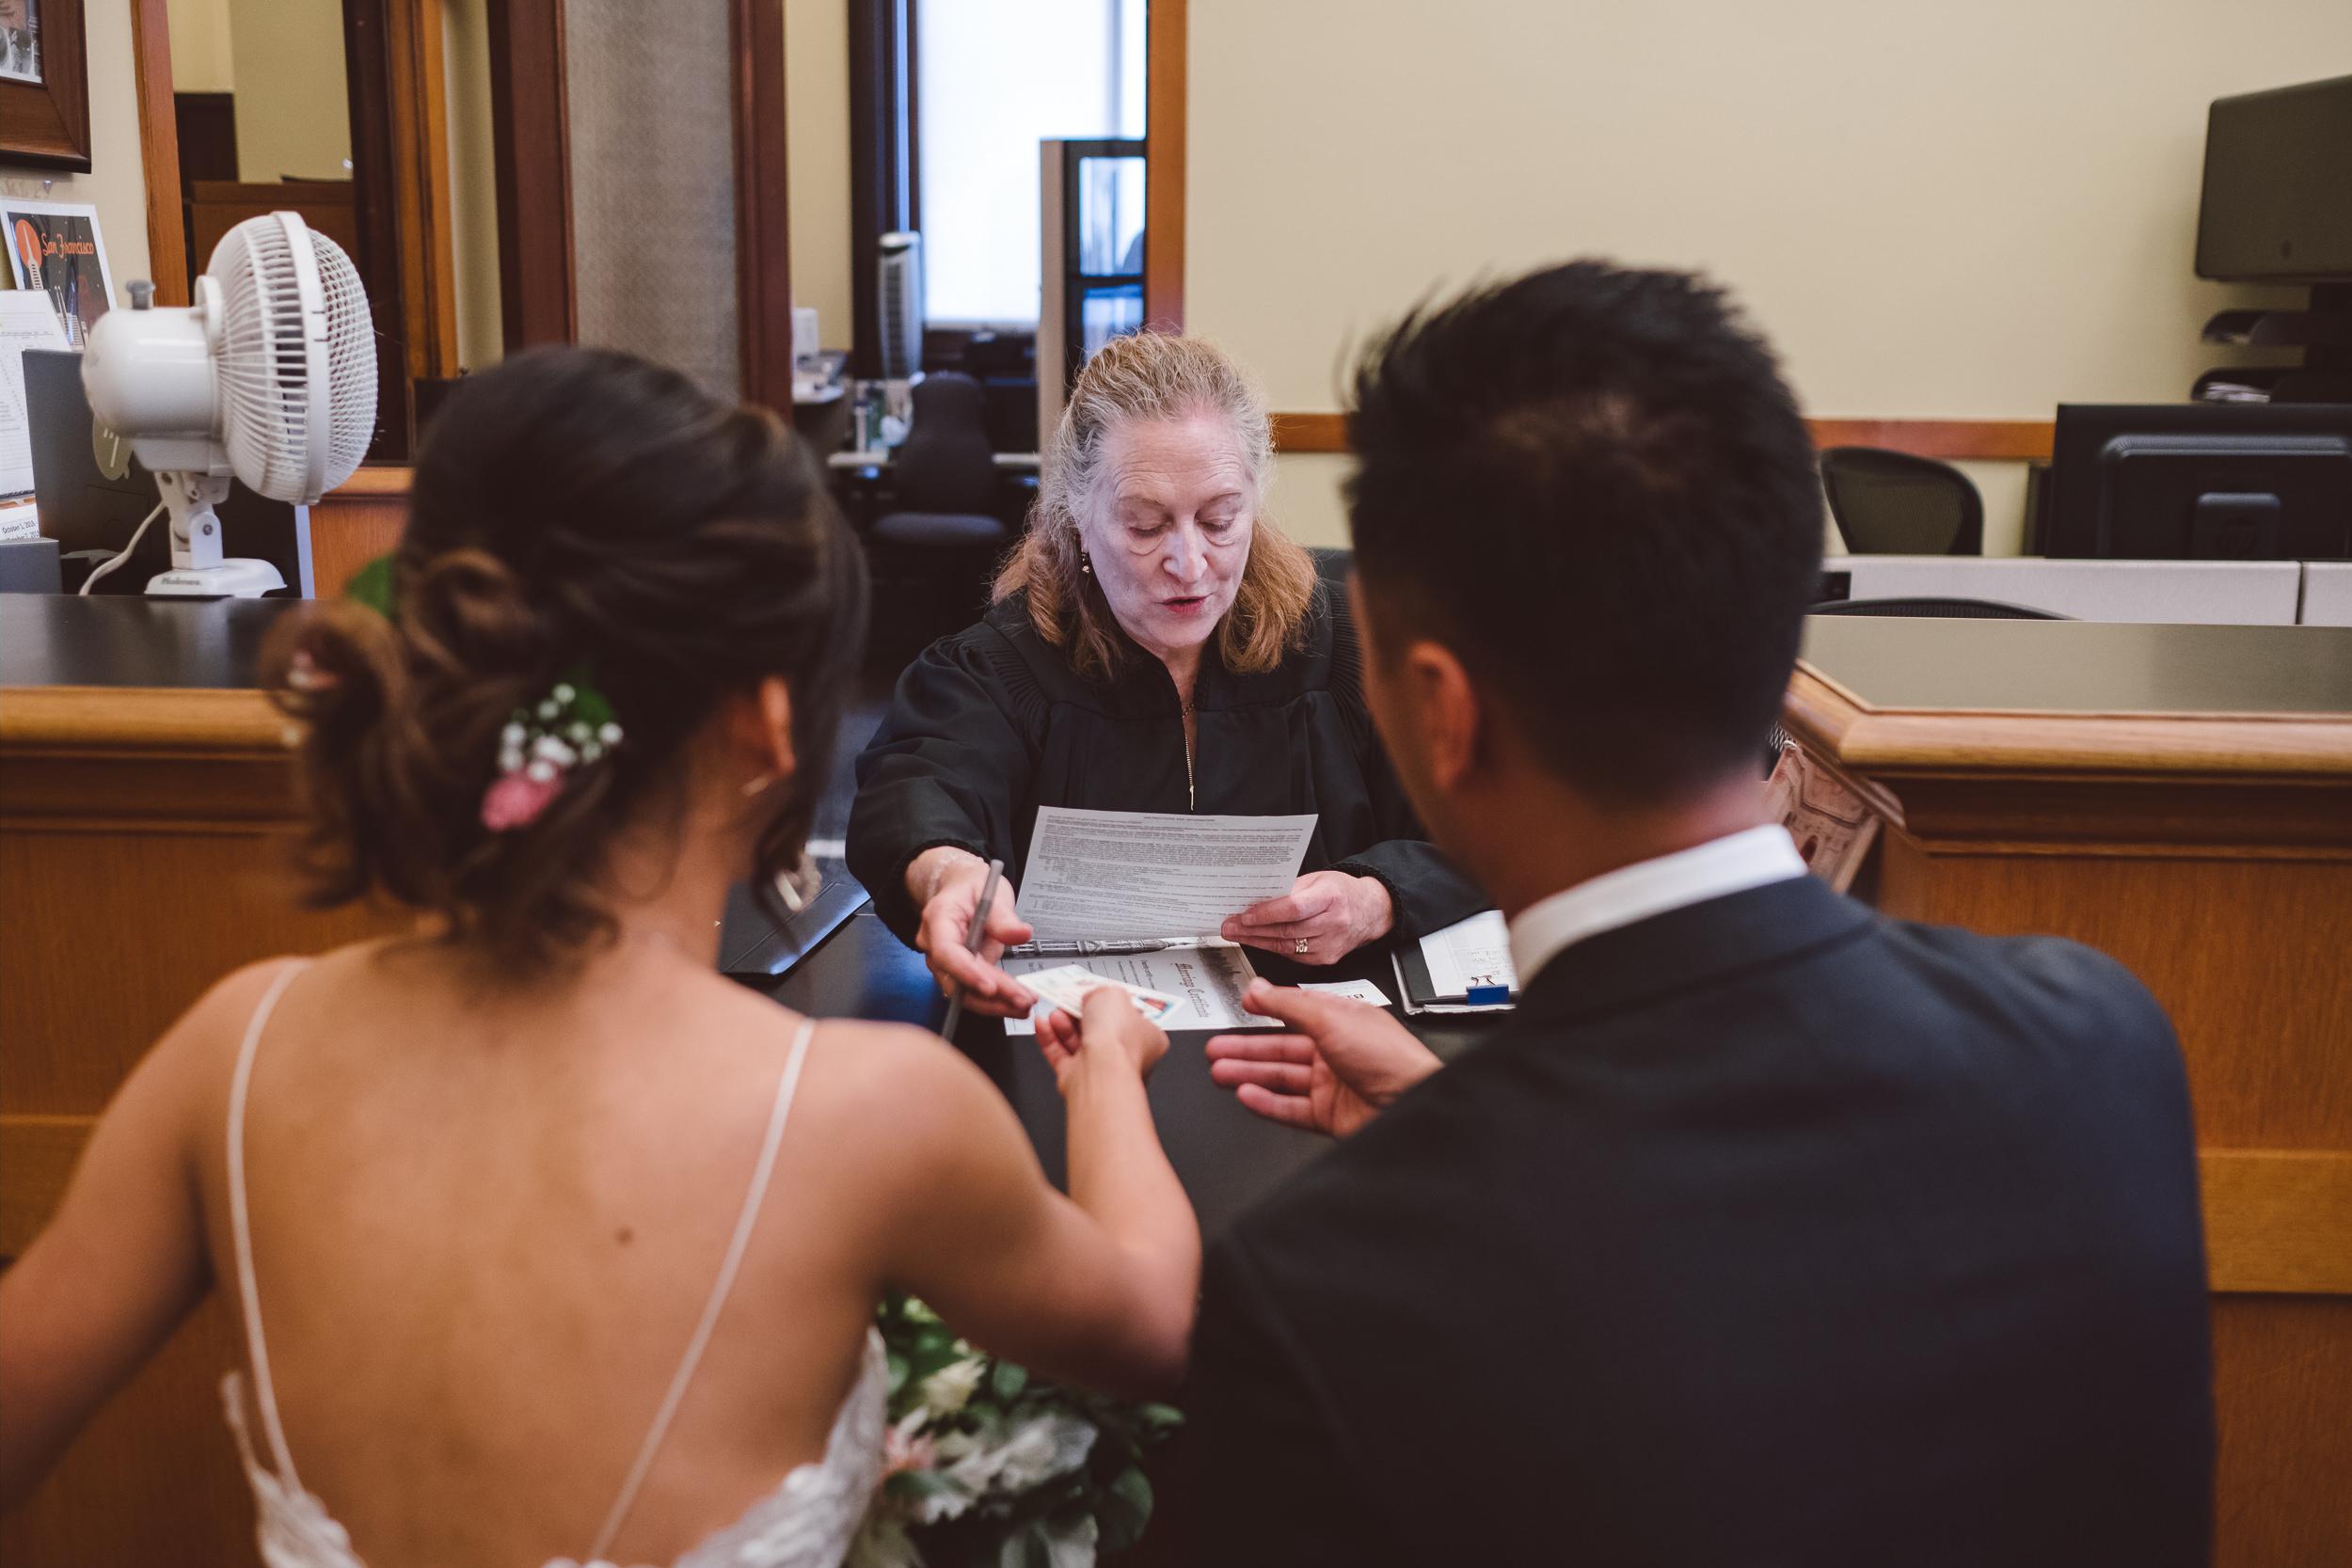 San-Francisco-City-Hall-Wedding-Photography-044.jpg